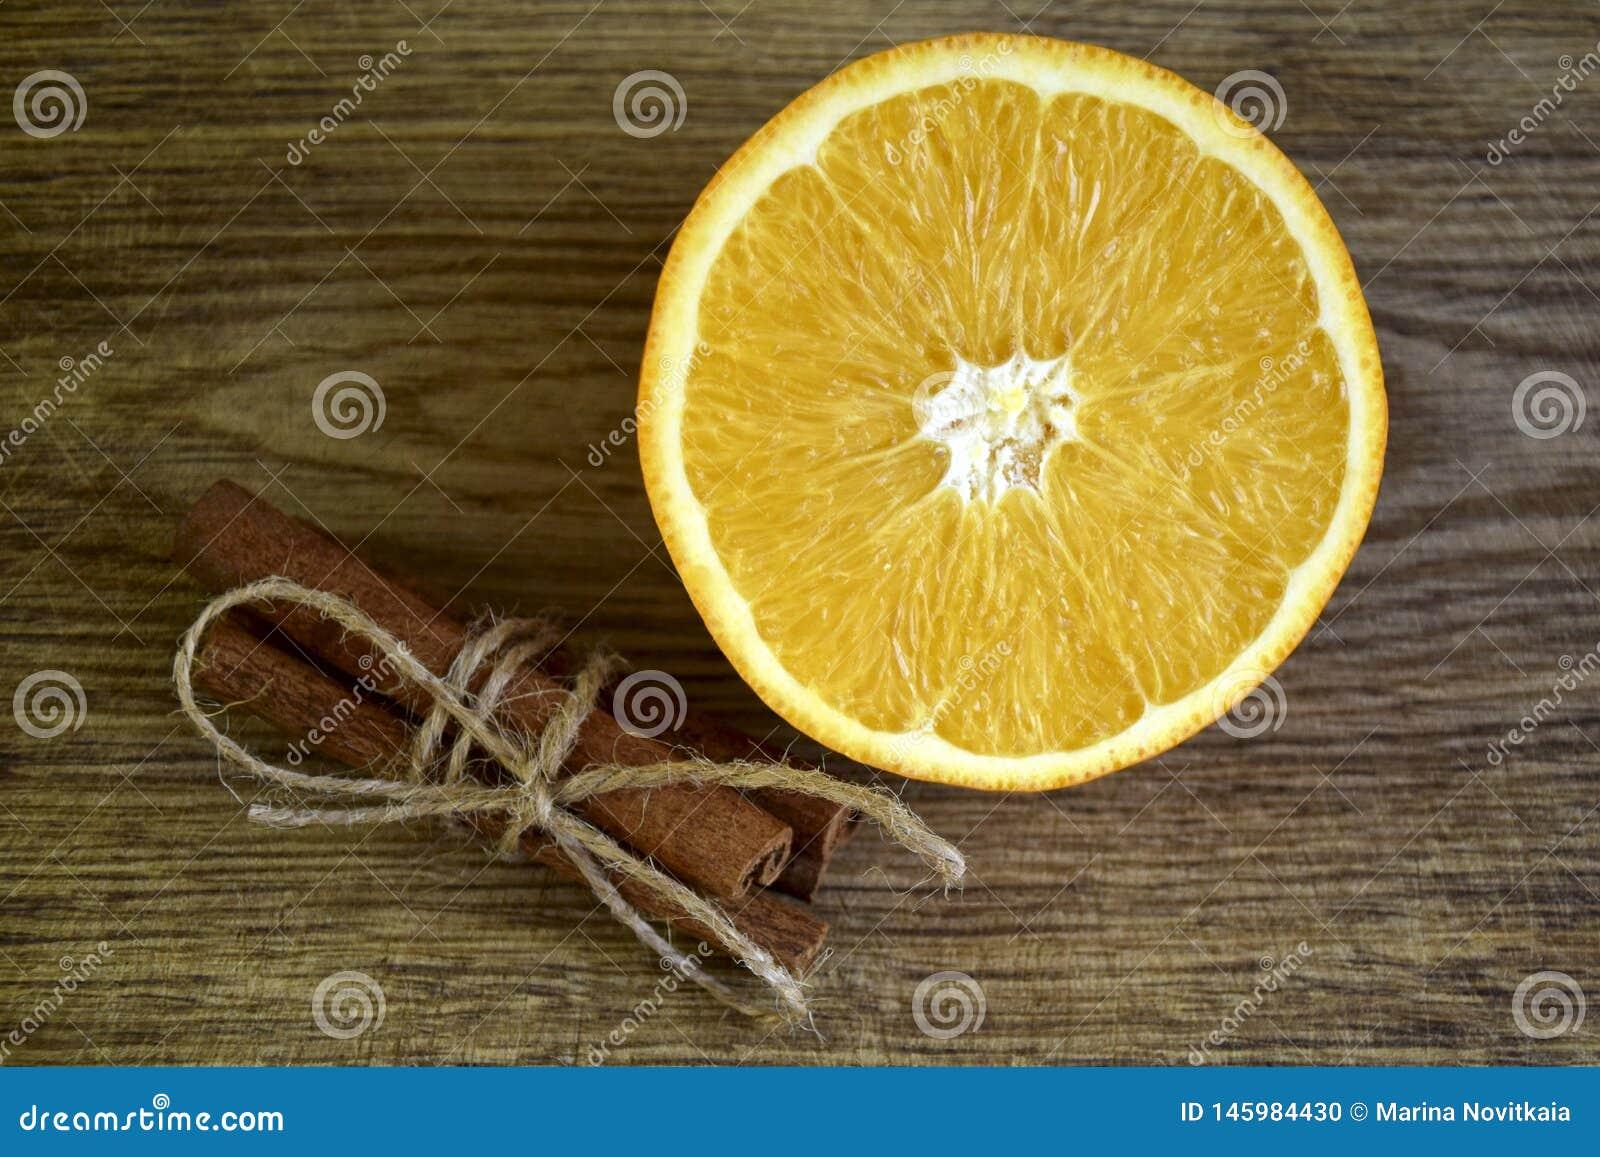 Ripe orange, Cinnamon sticks on wooden surface